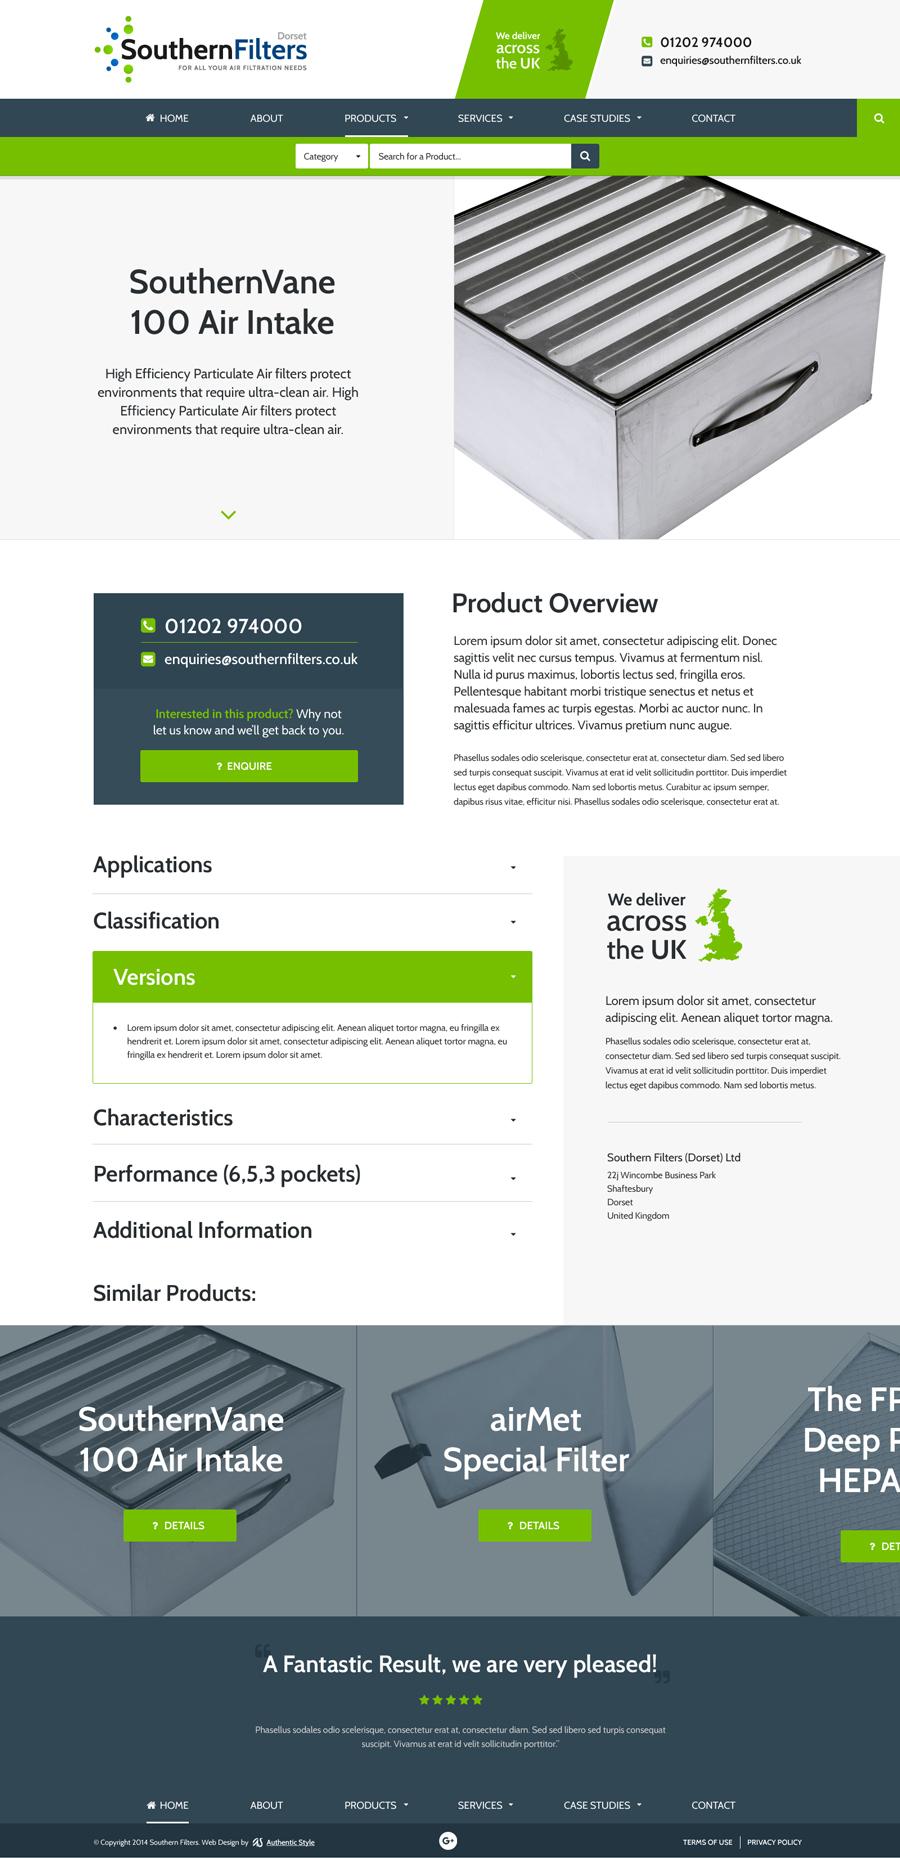 product-indv-sf-dorset